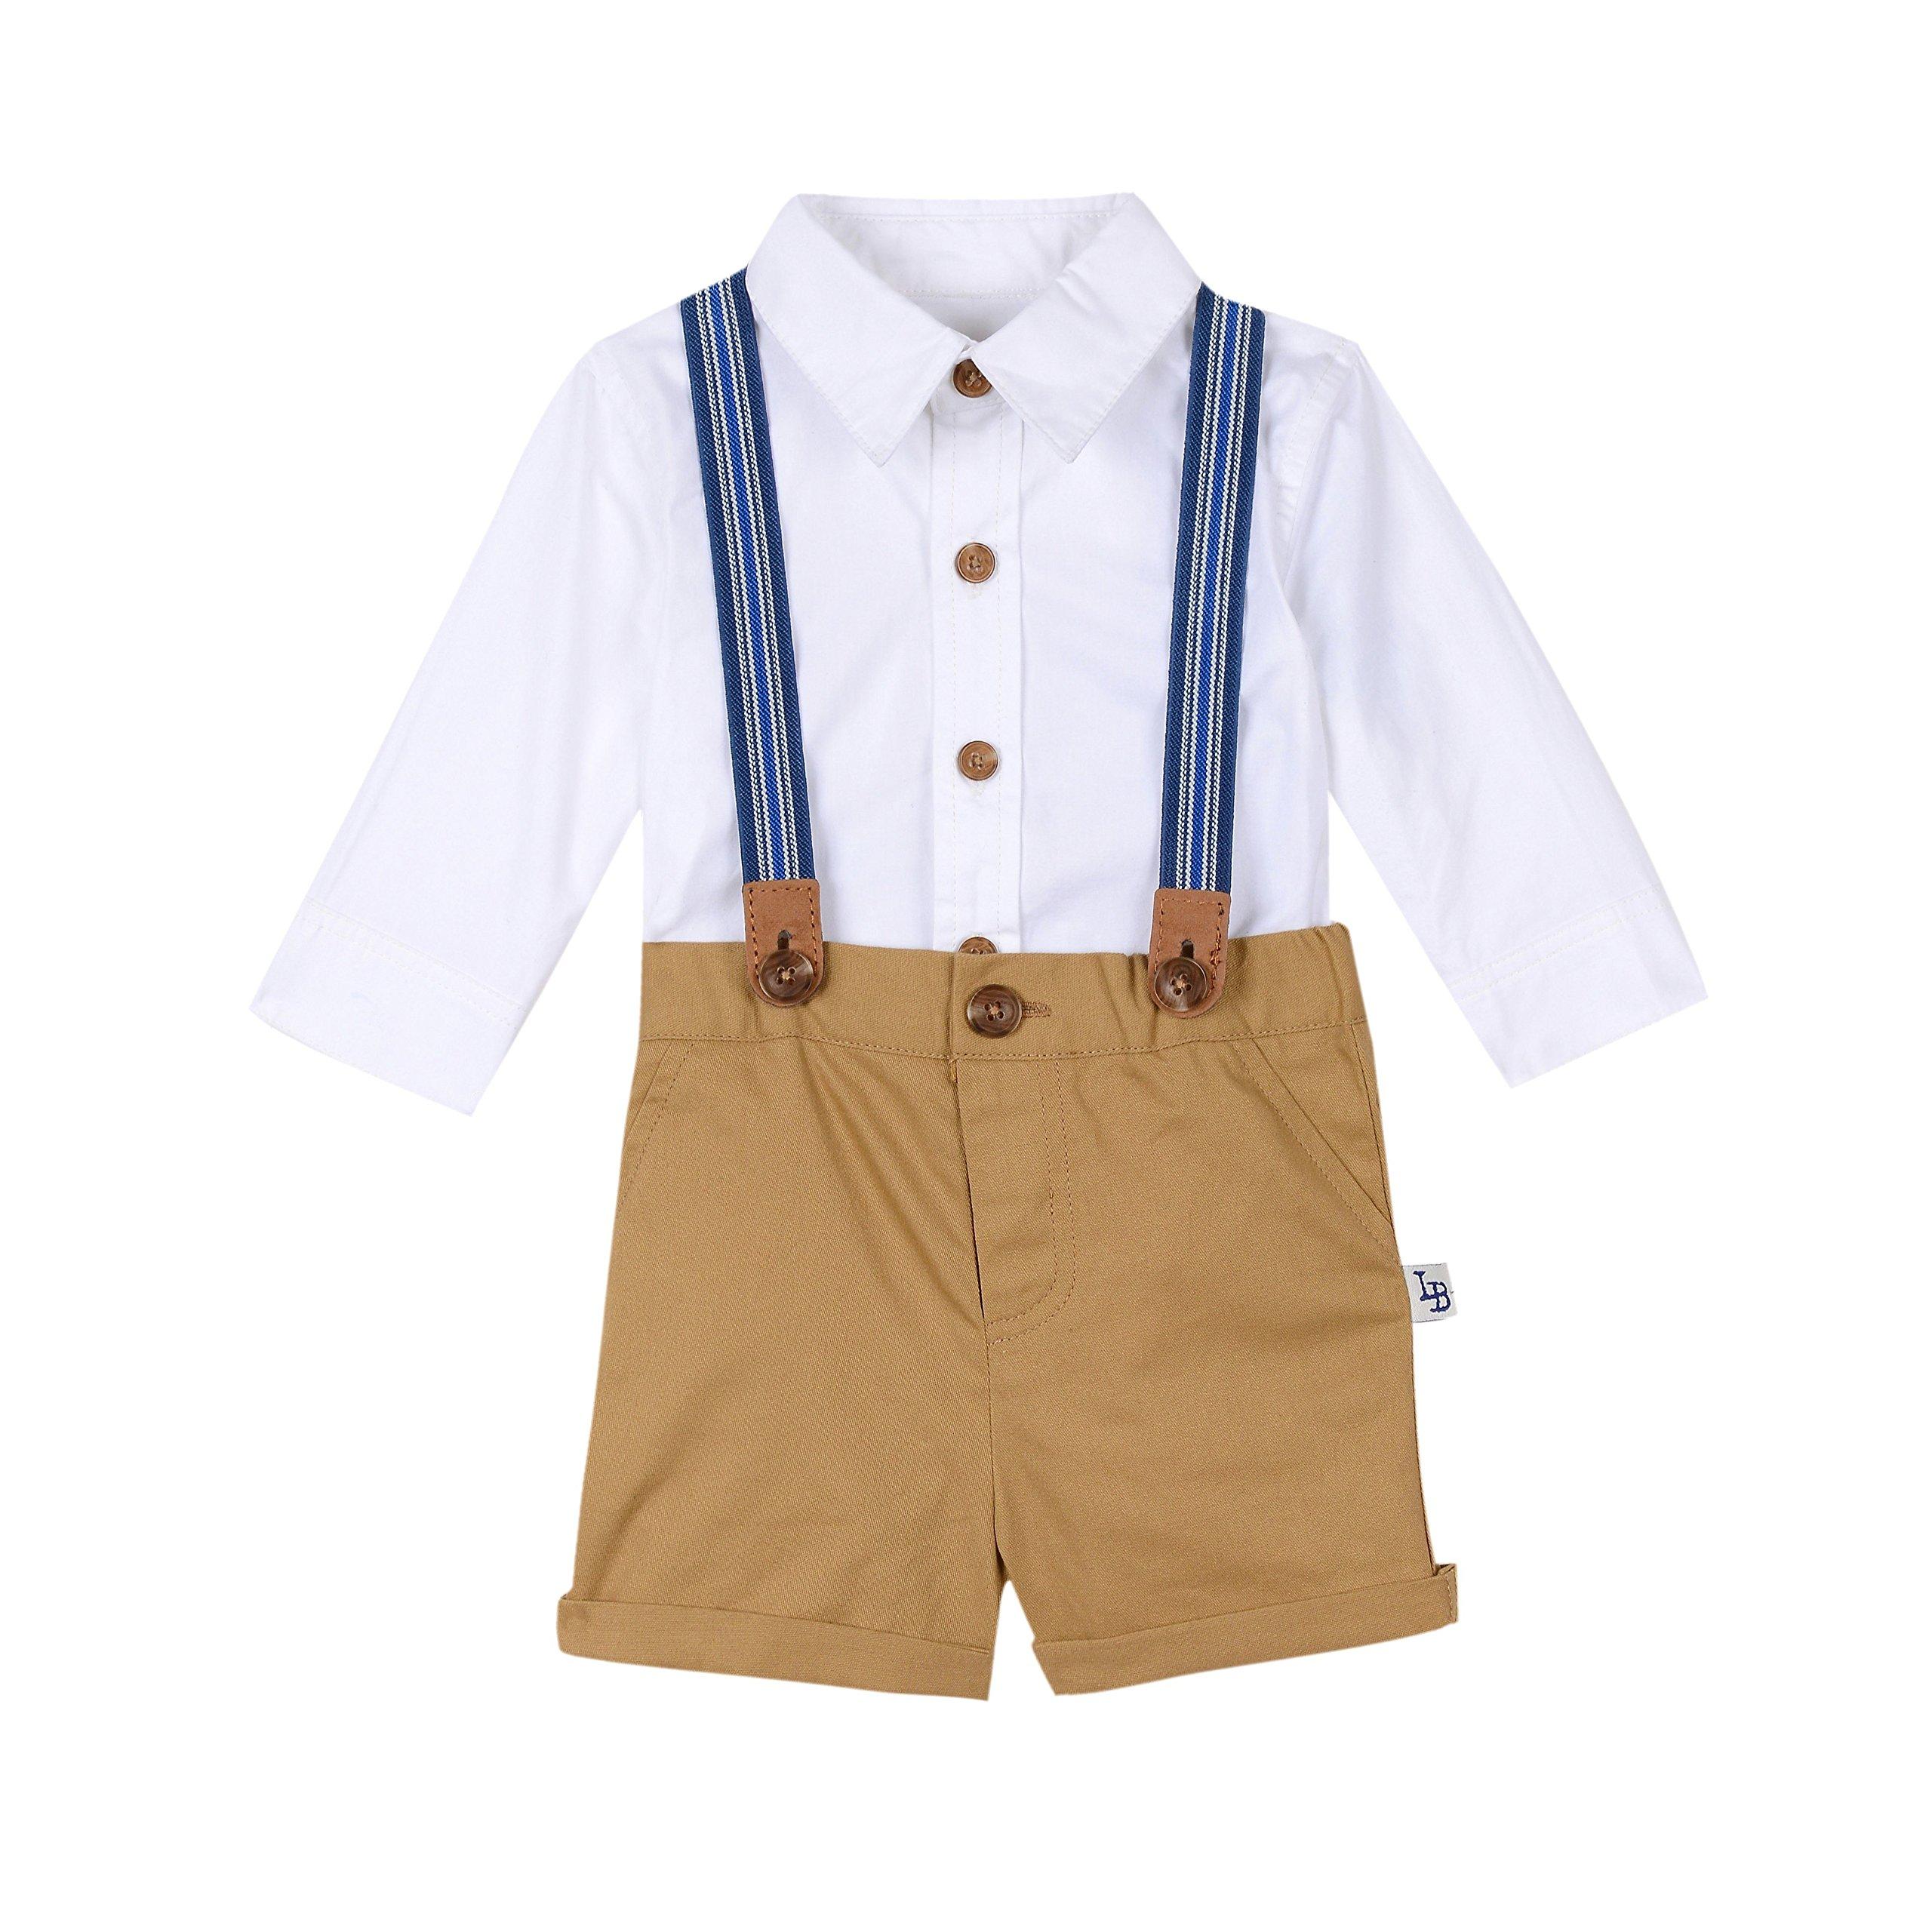 Little Brother Samuel Suspenders Set by PIPPA & JULIE (Image #1)